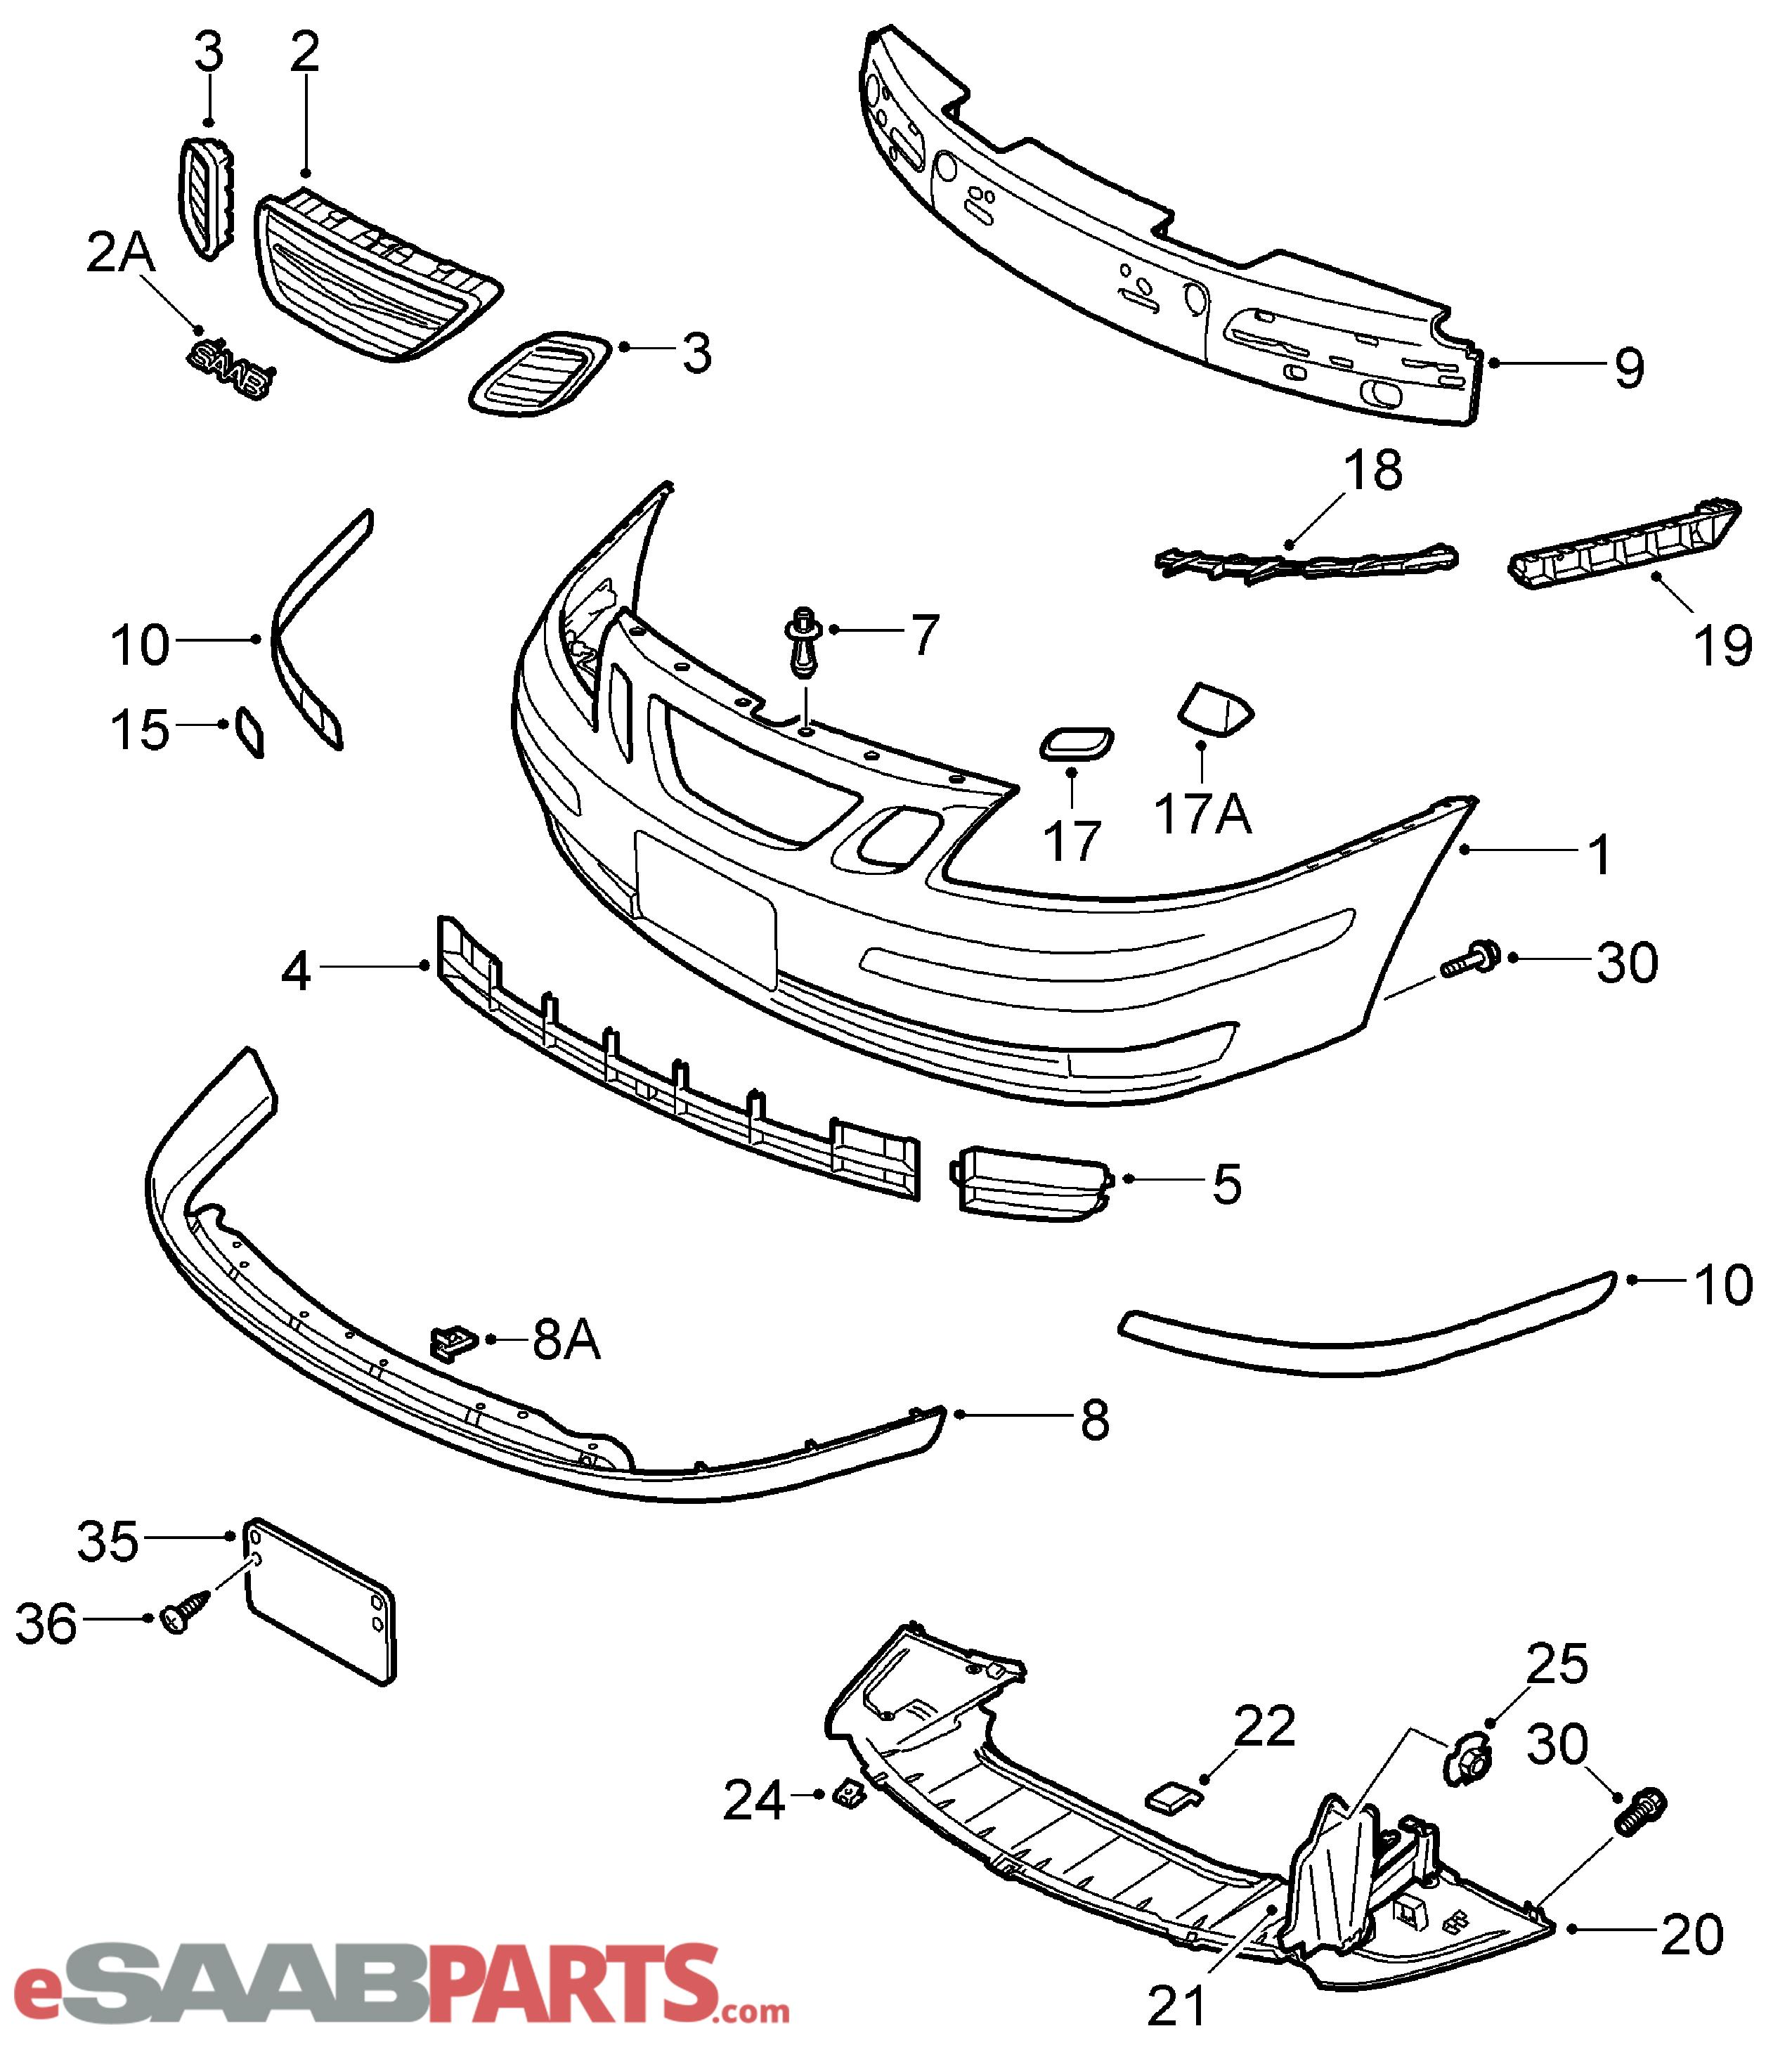 [32016151] SAAB Front Lip Spoiler, 9-3 Aero/Vector 03-07